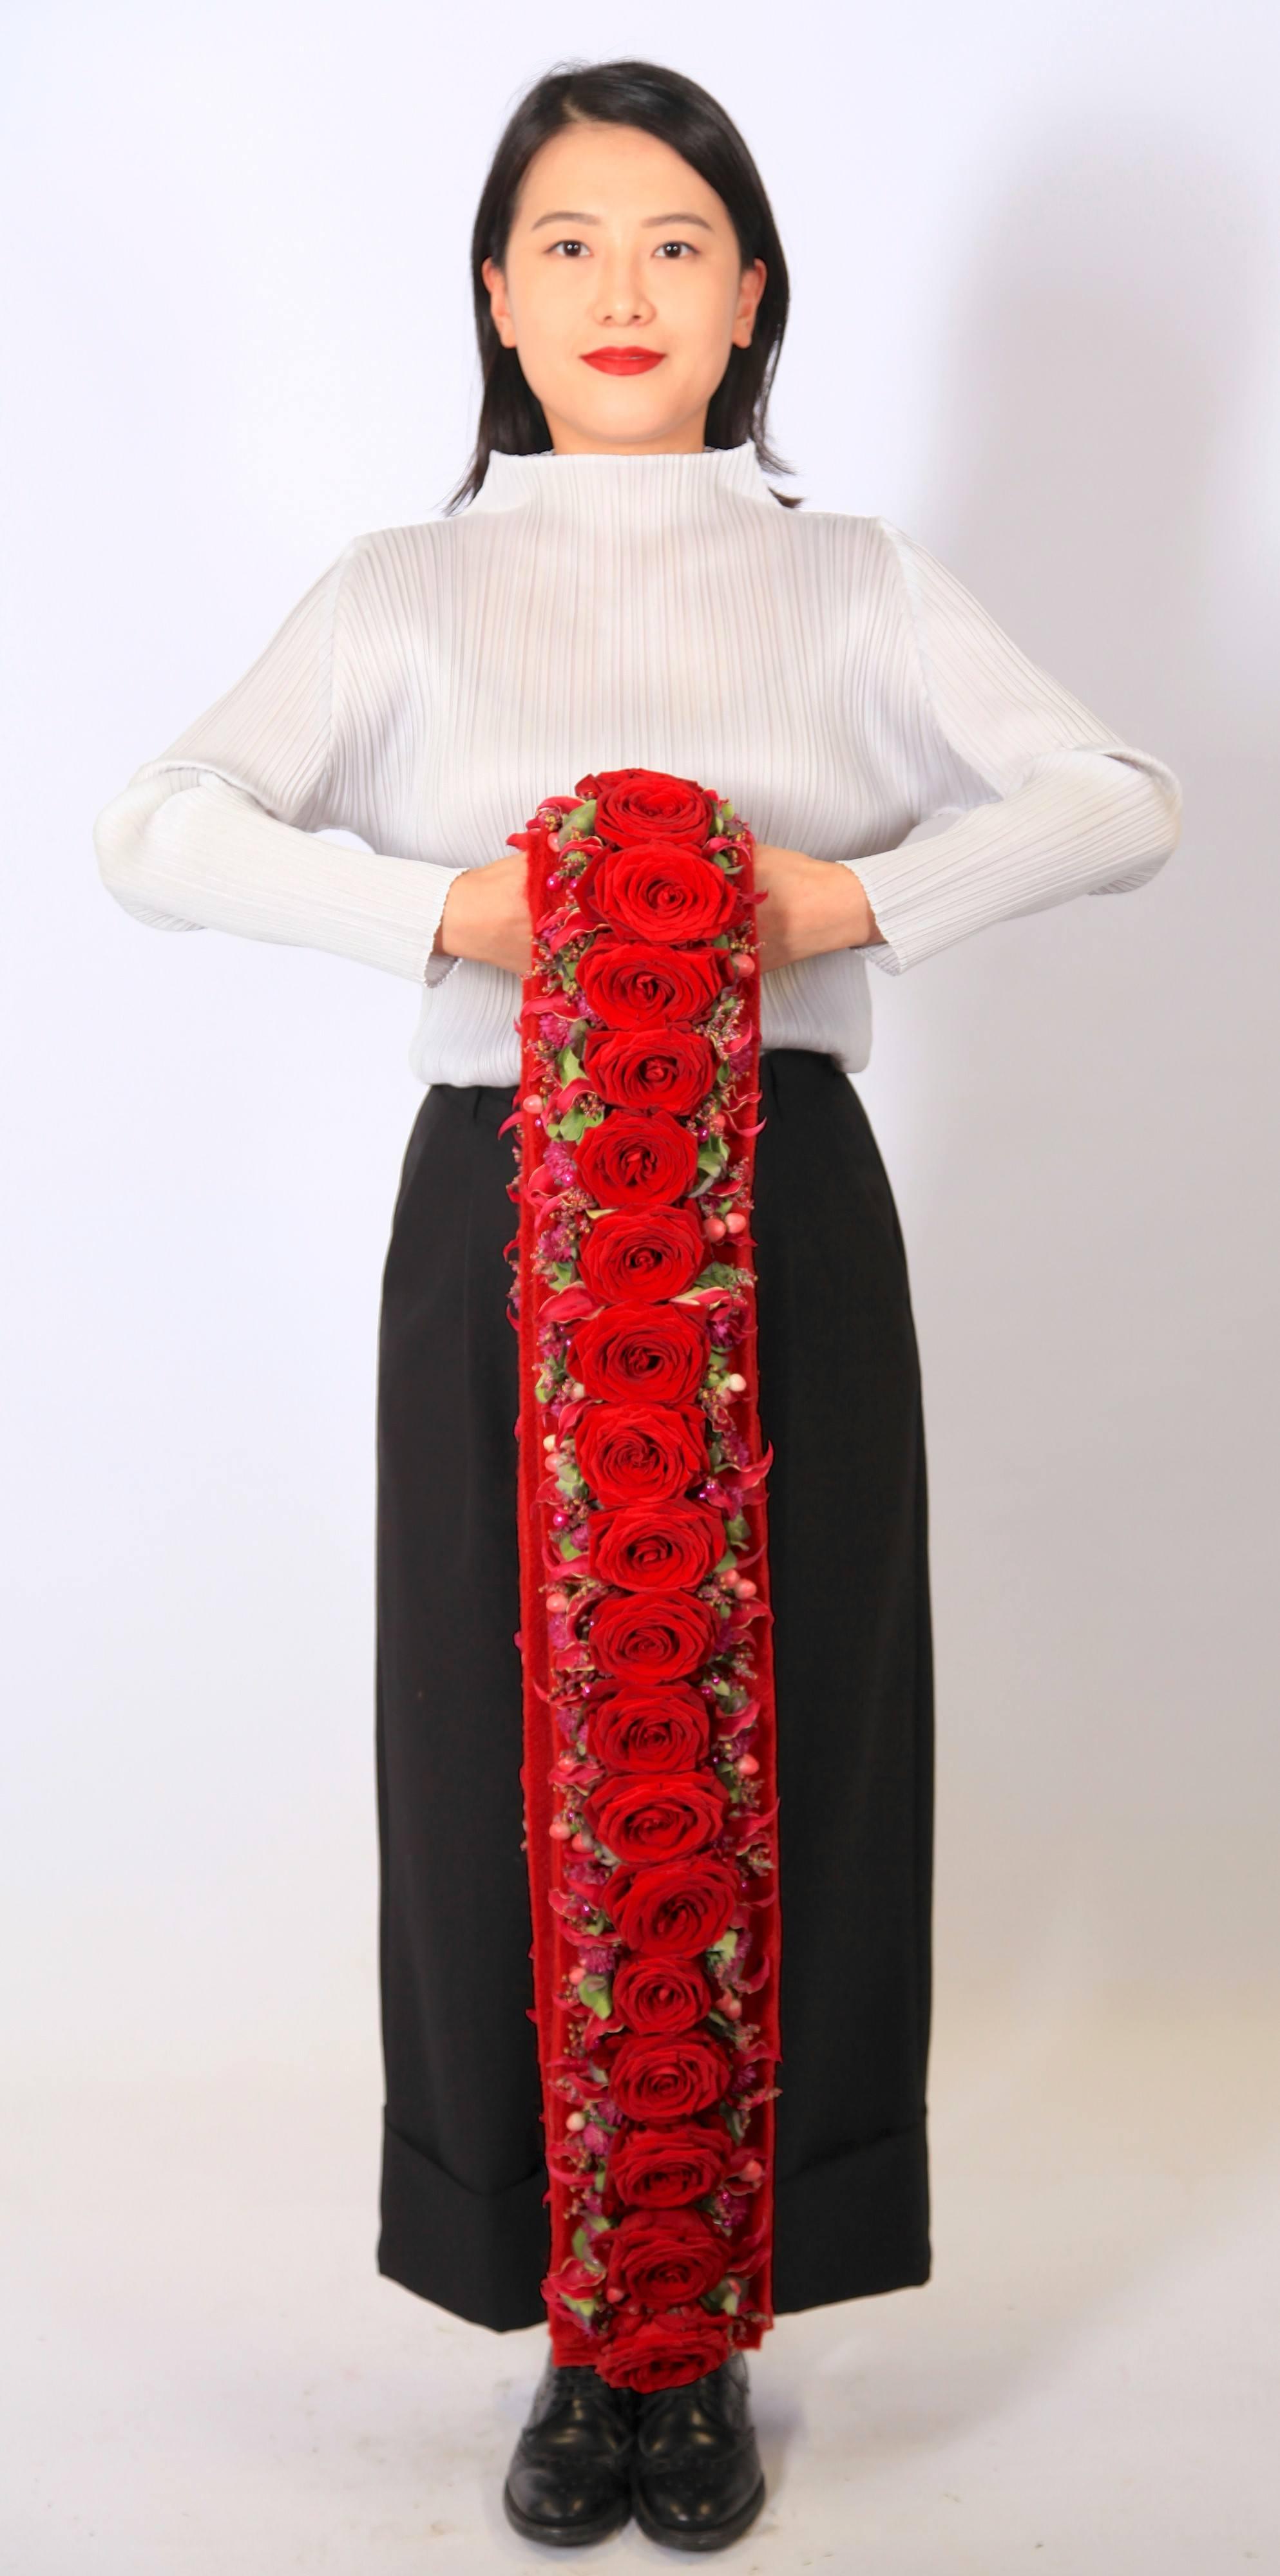 porta nova red naomi alex segura spanish designer valentines day 33